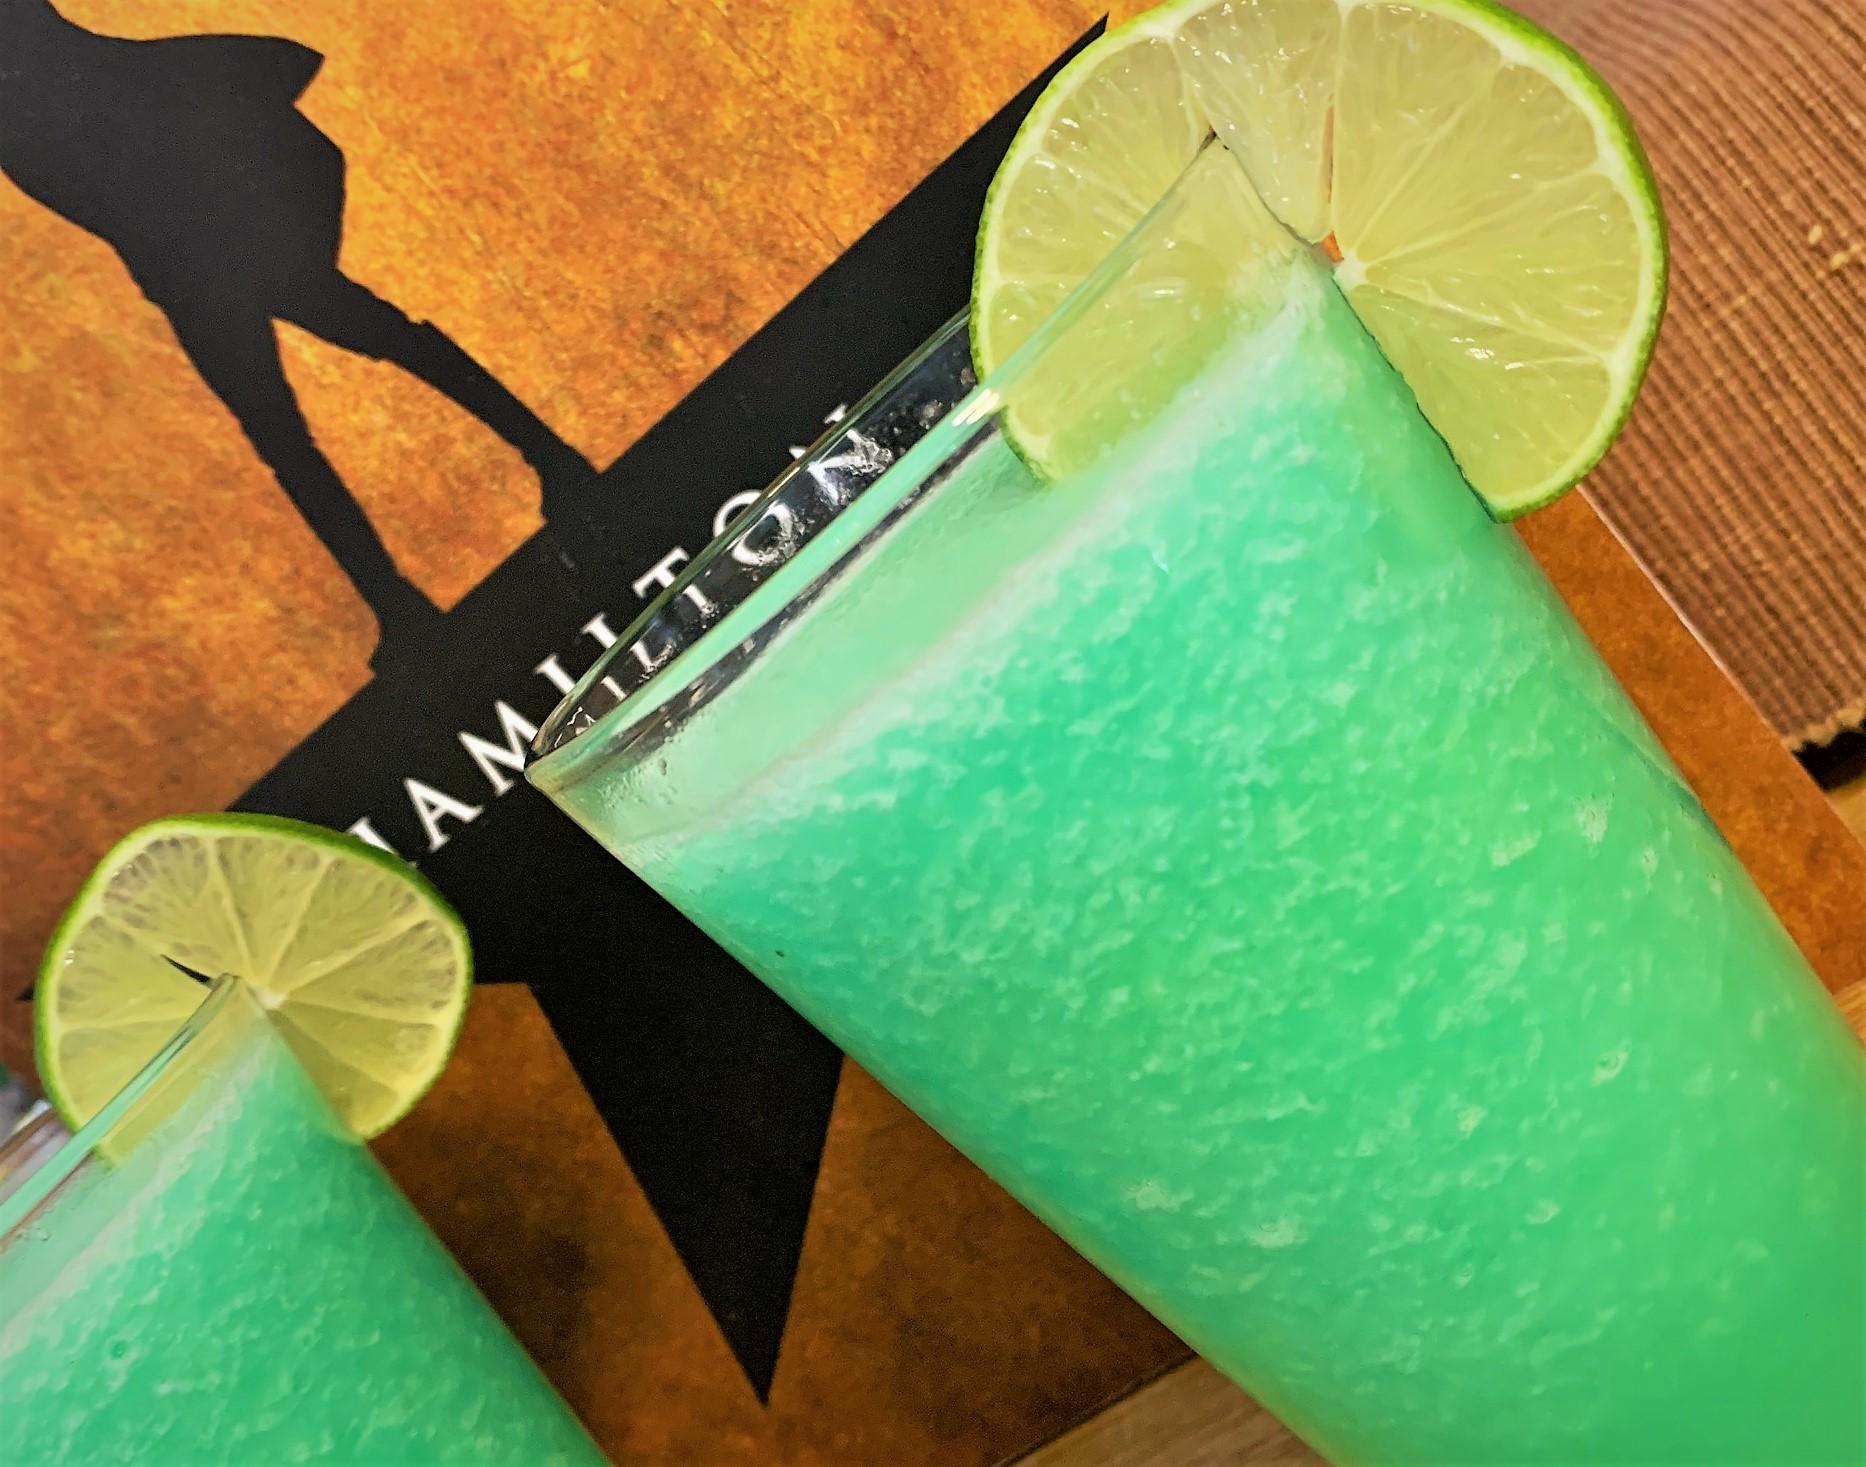 Hamil-Colada - A Hamilton Inspired Cocktail